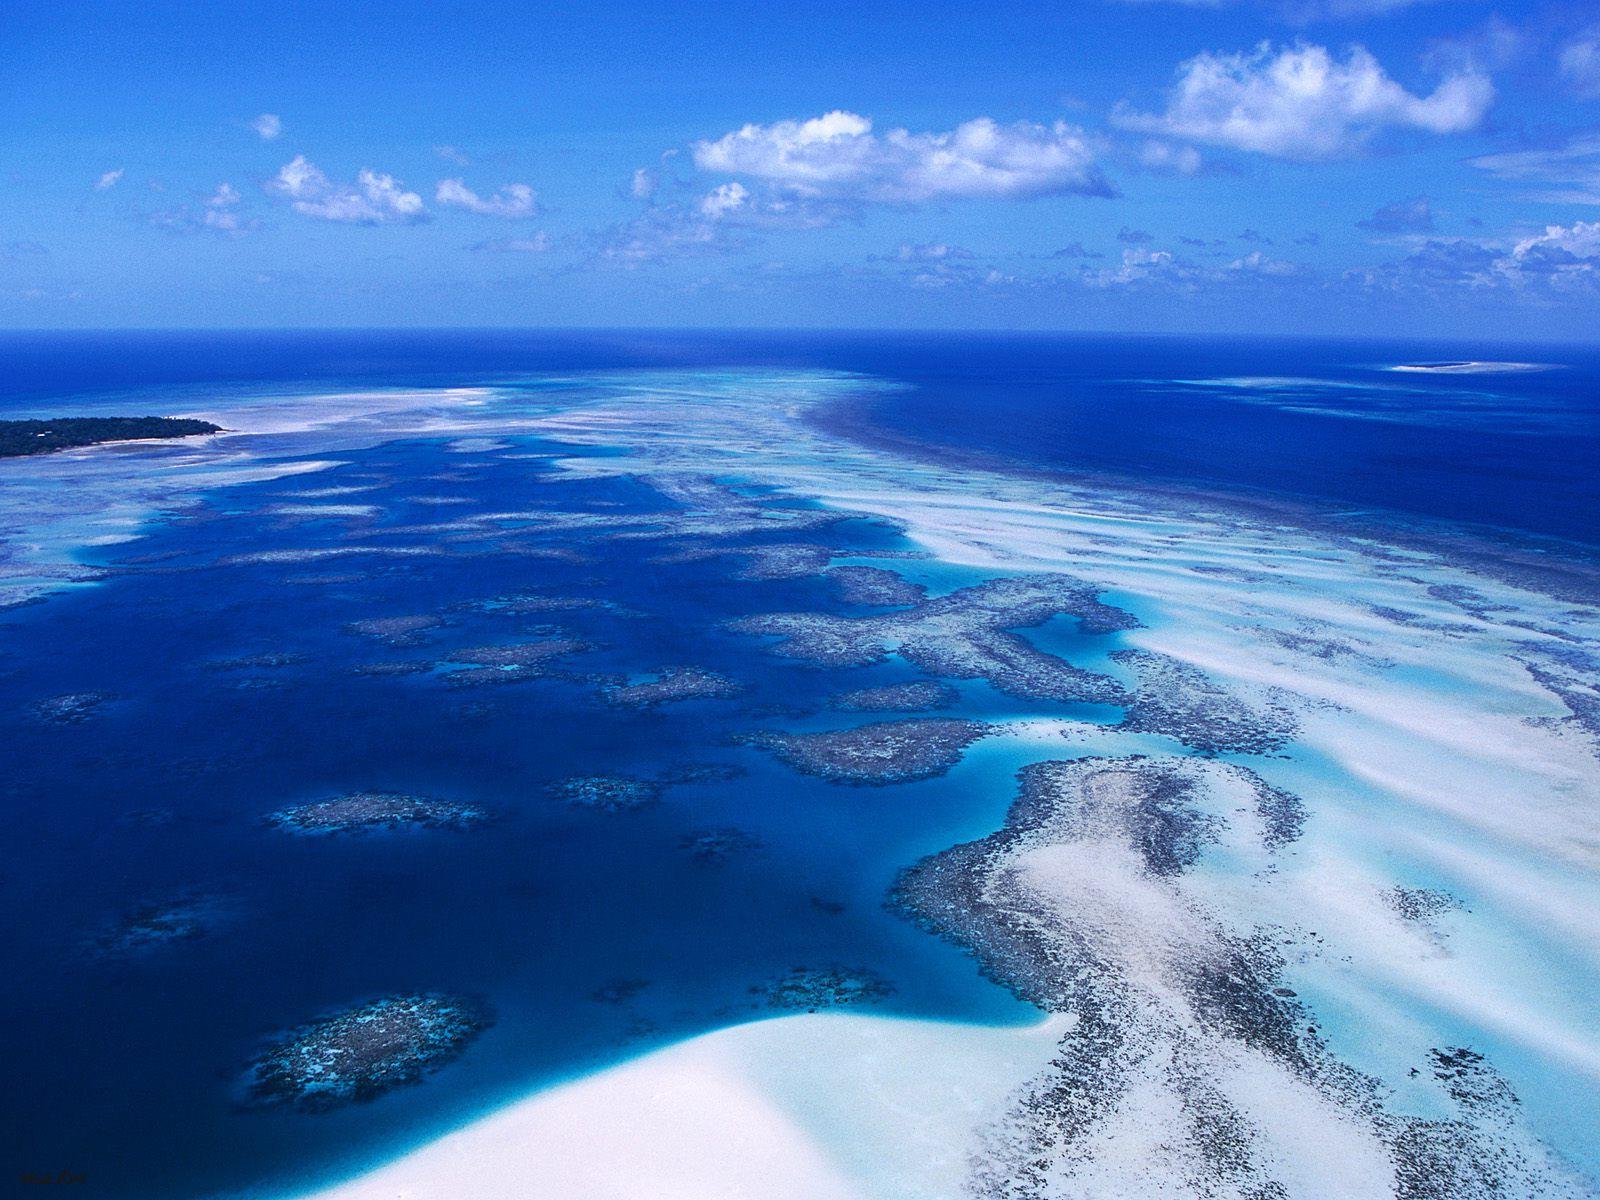 Australia-Beach-Blue-Background-Images